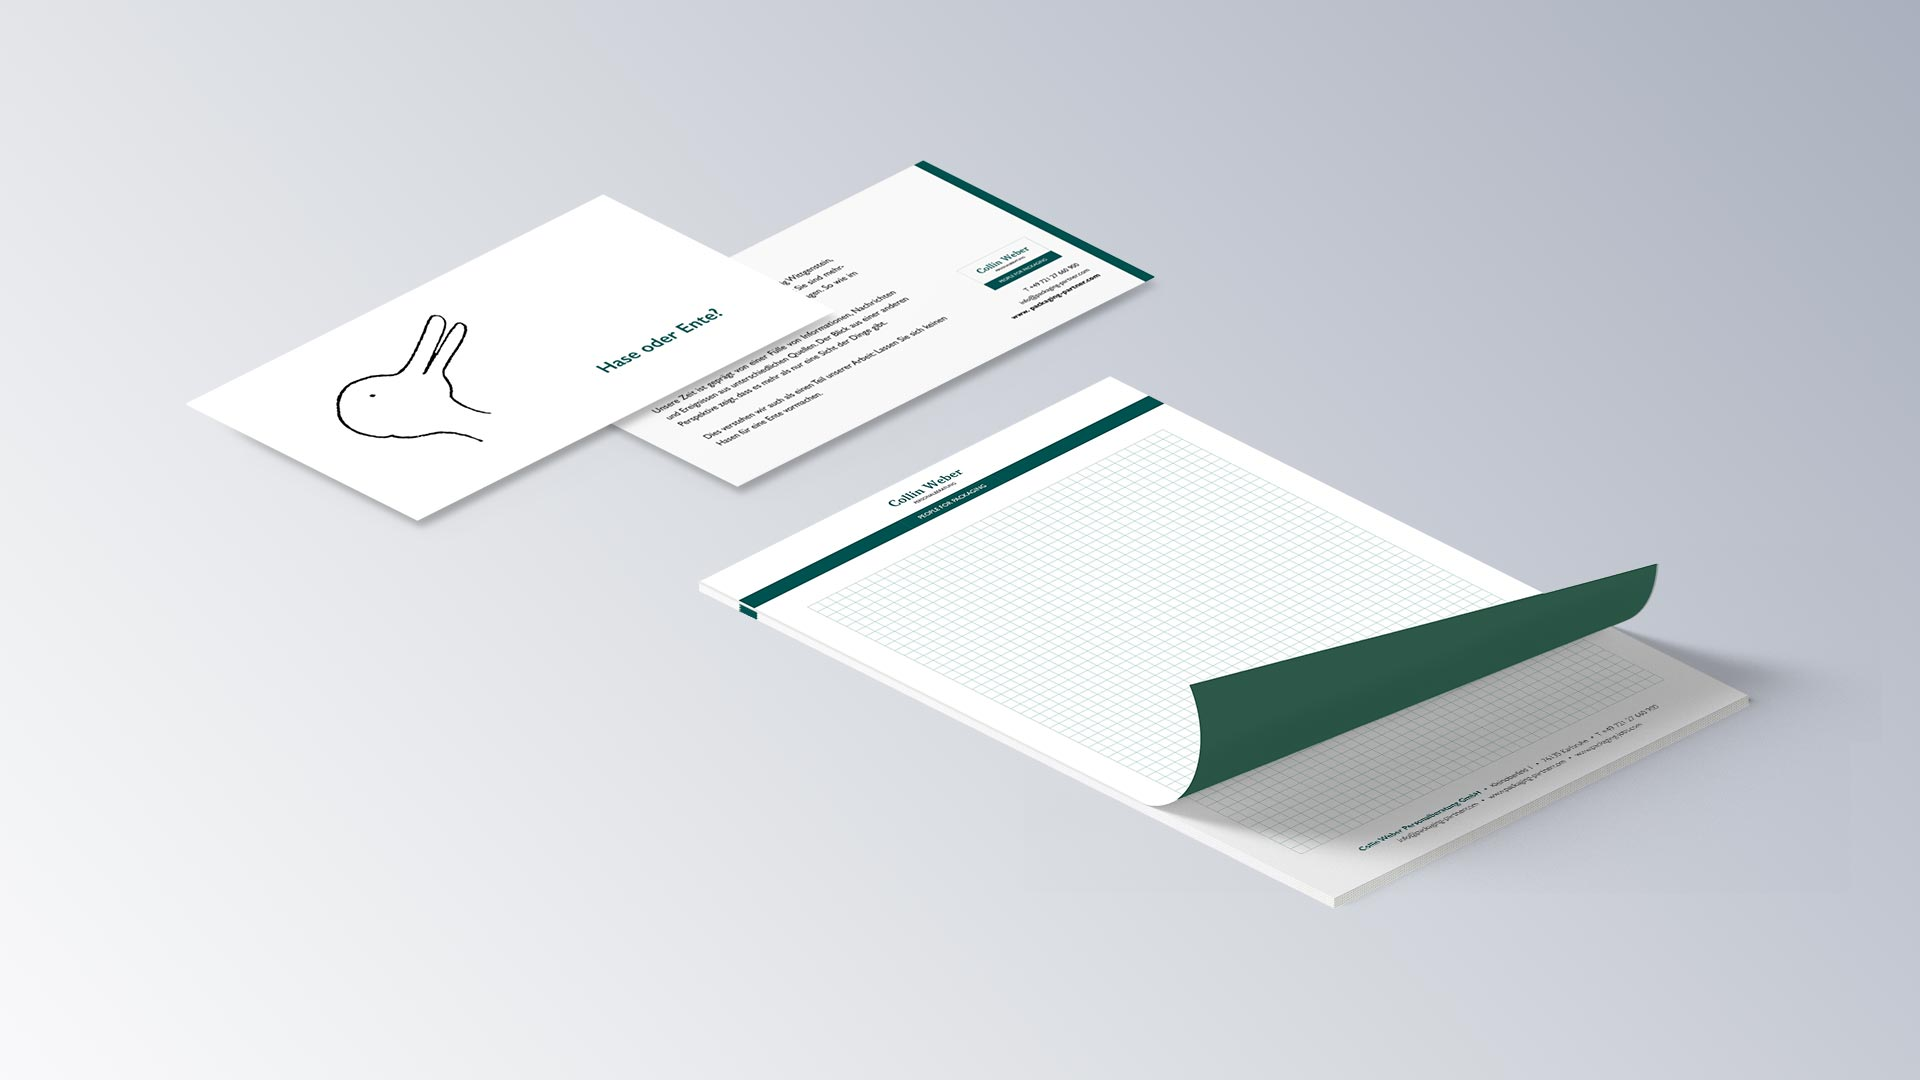 Collin Weber Personalberatung Karte Flyer Schreibblock Block